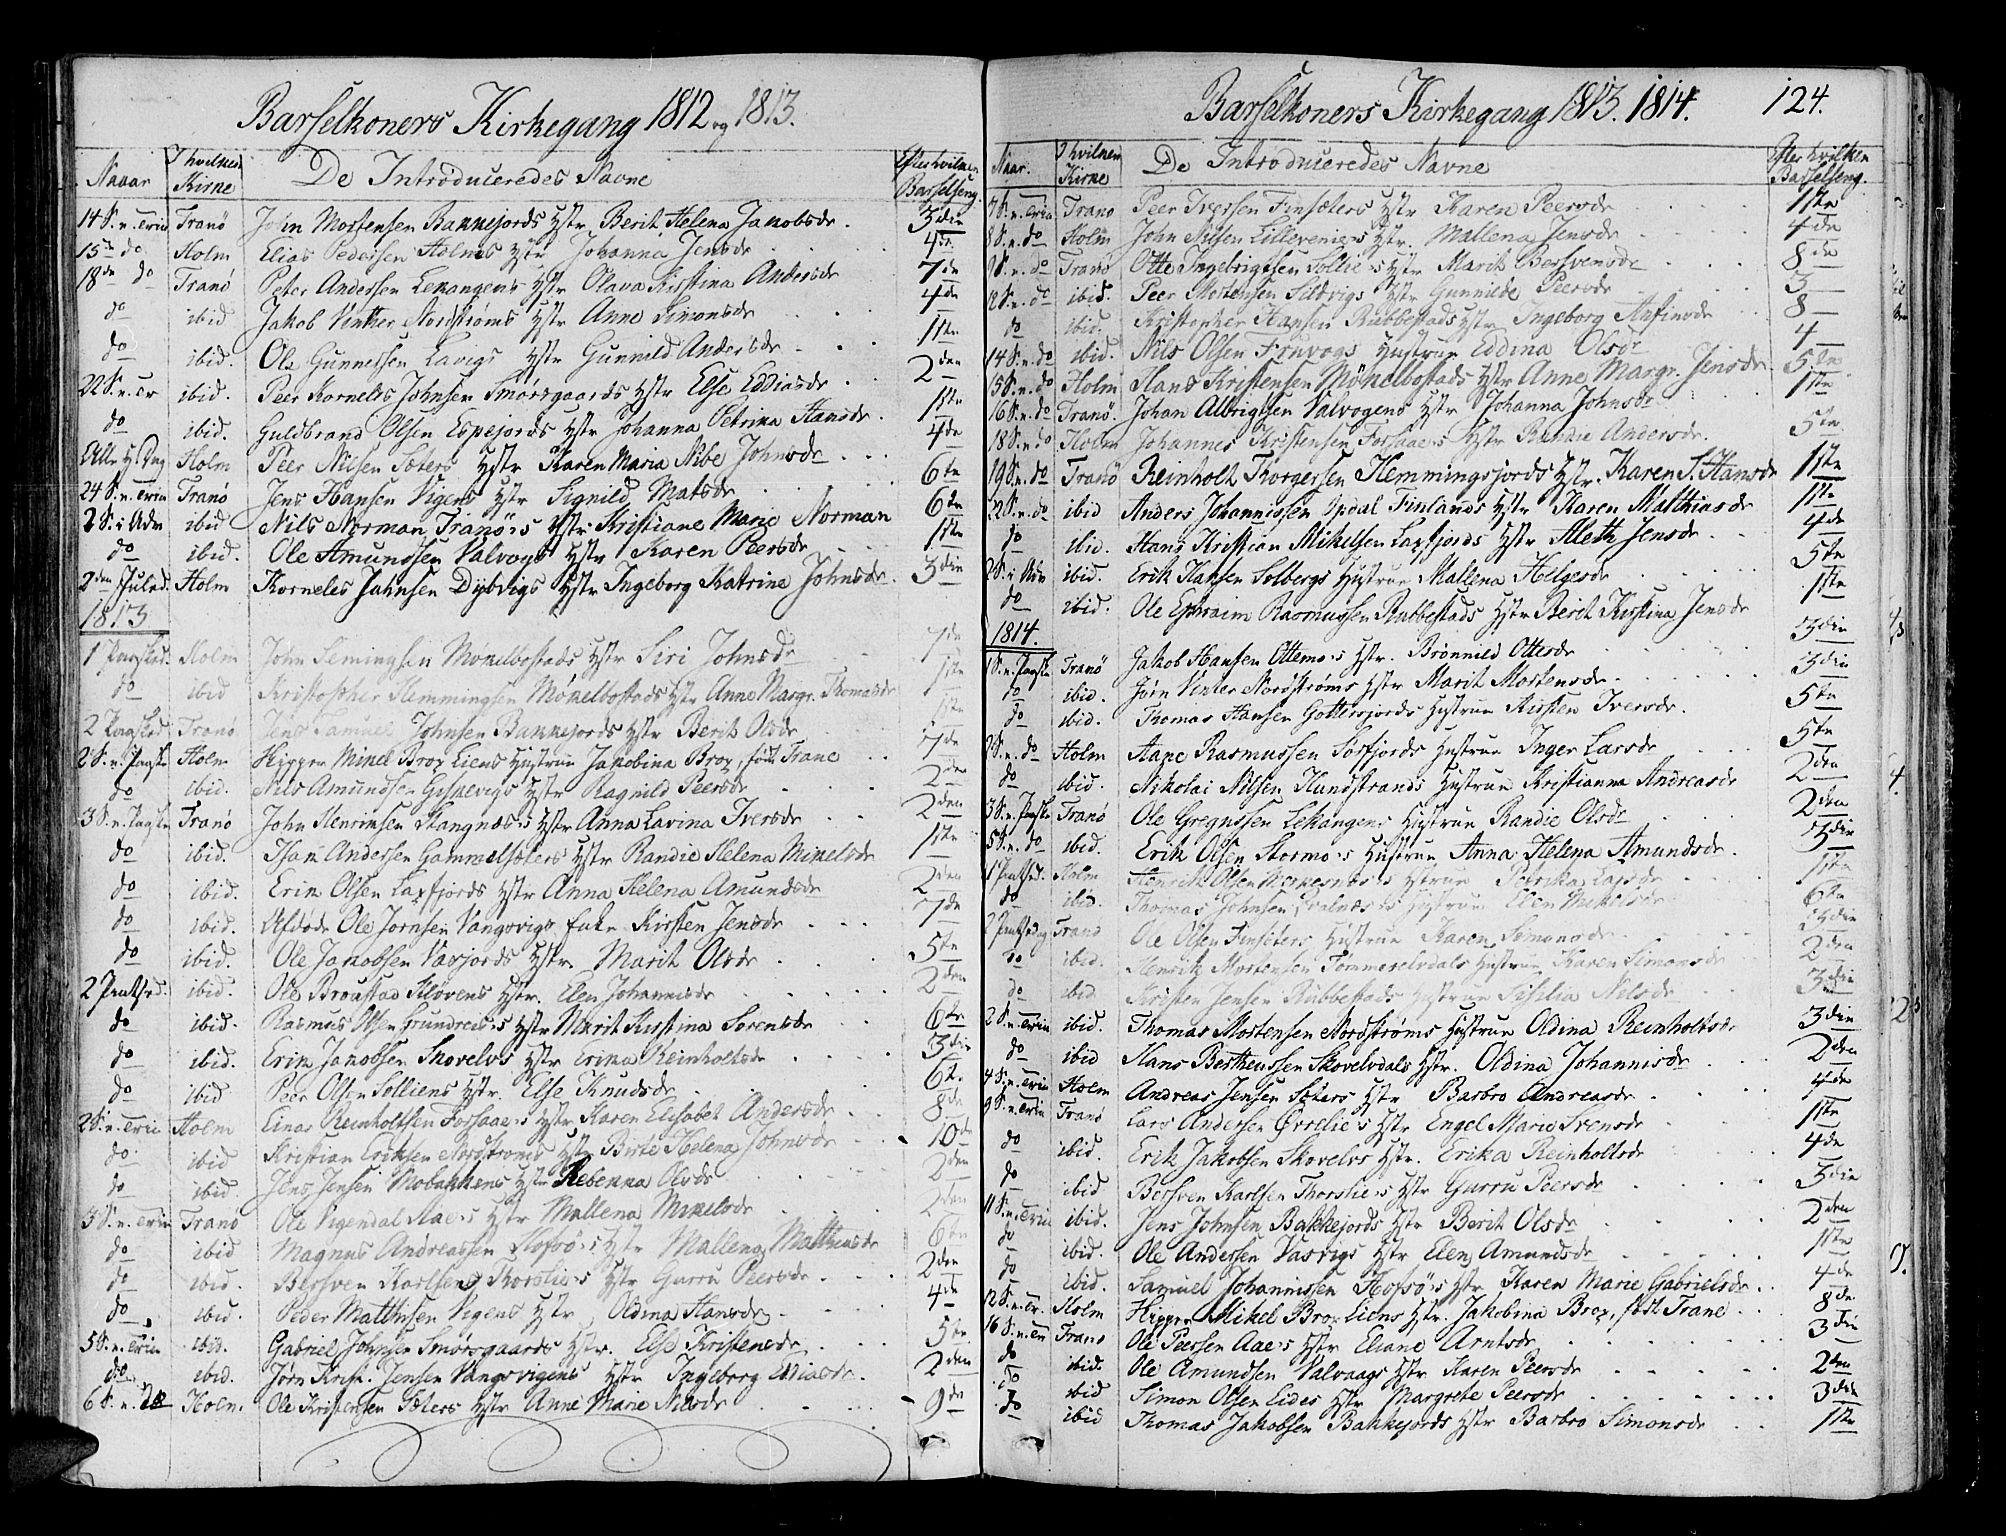 SATØ, Tranøy sokneprestkontor, I/Ia/Iaa/L0003kirke: Ministerialbok nr. 3, 1807-1820, s. 124